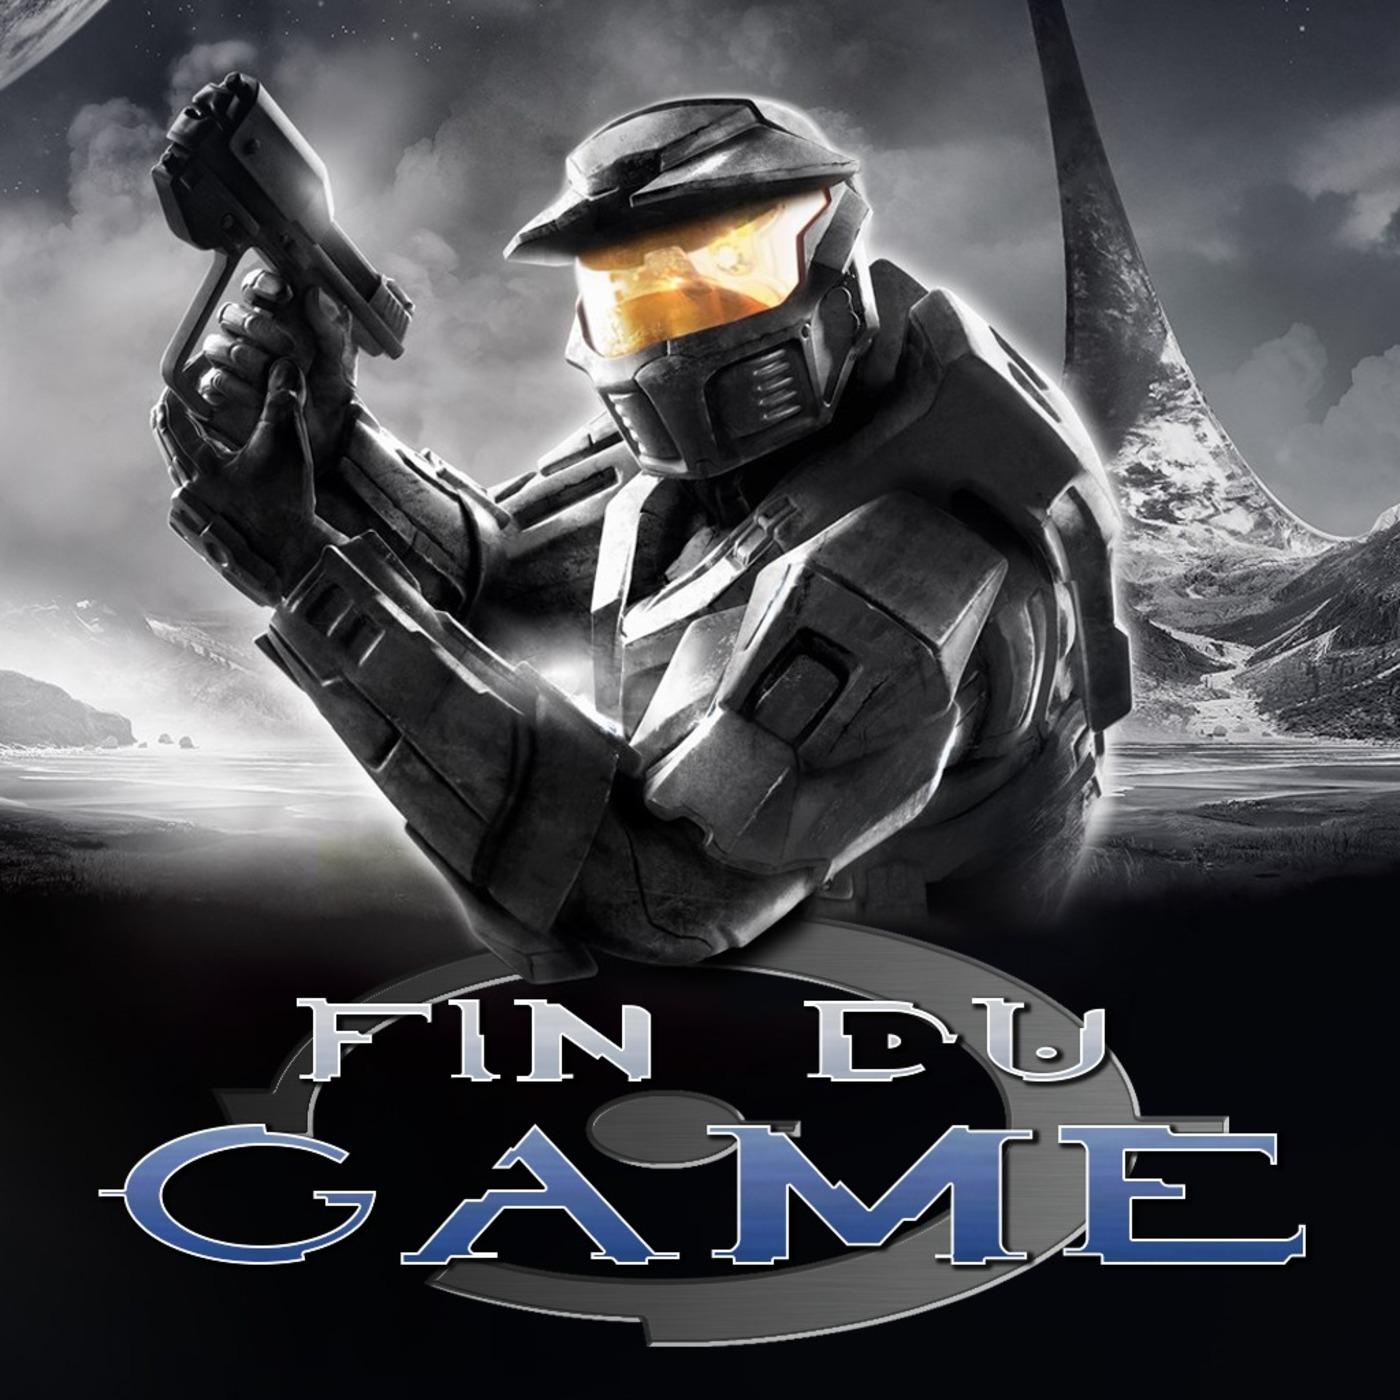 Episode 49 - Halo: Combat Evolved